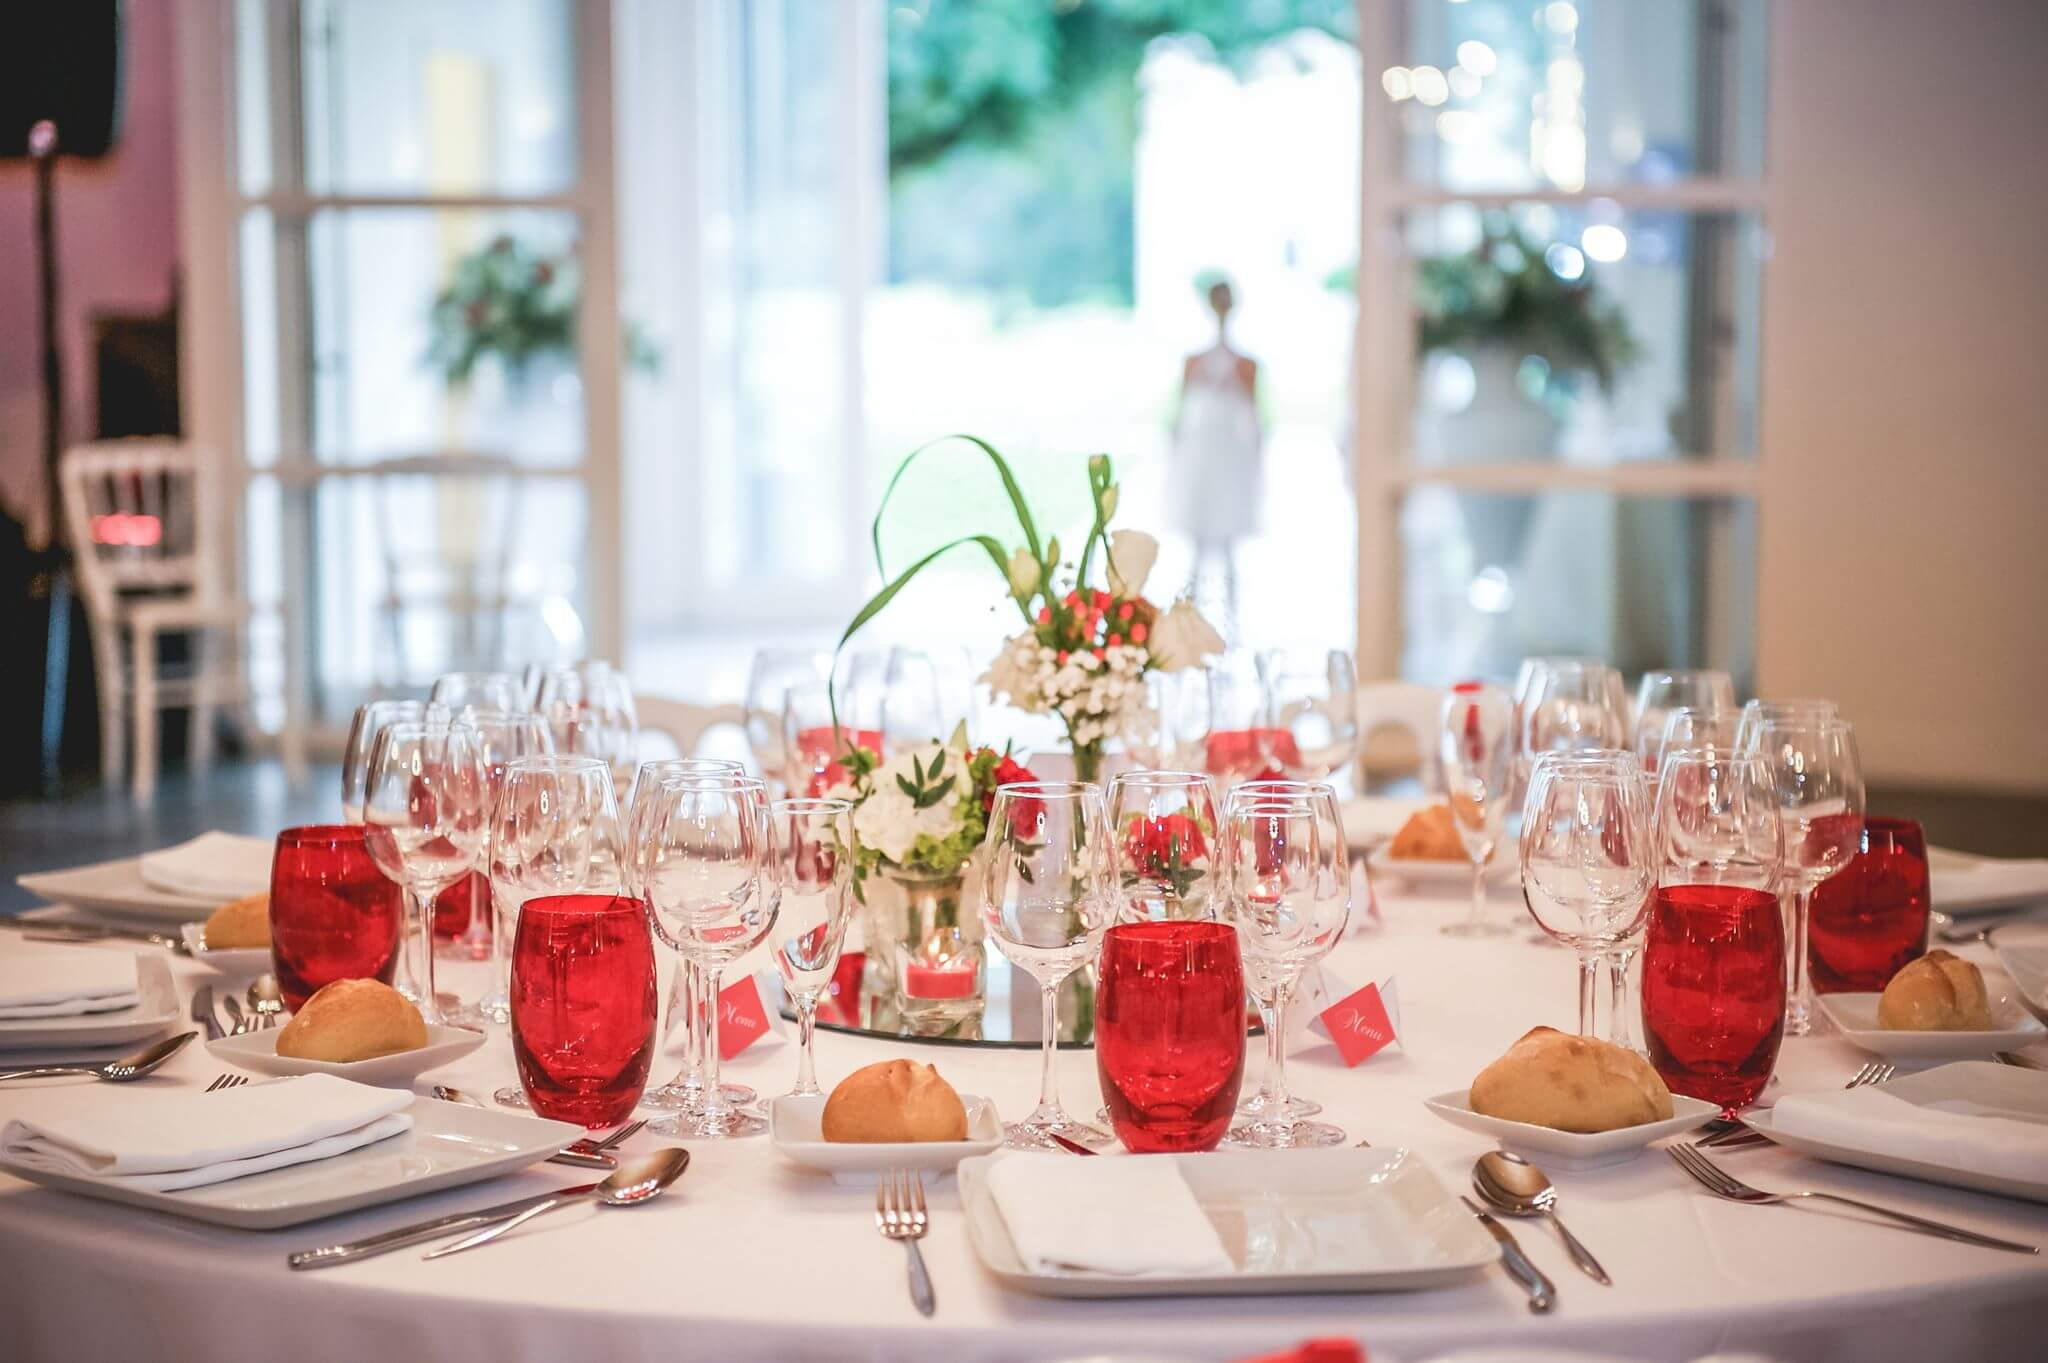 once upon a time, décoration de table